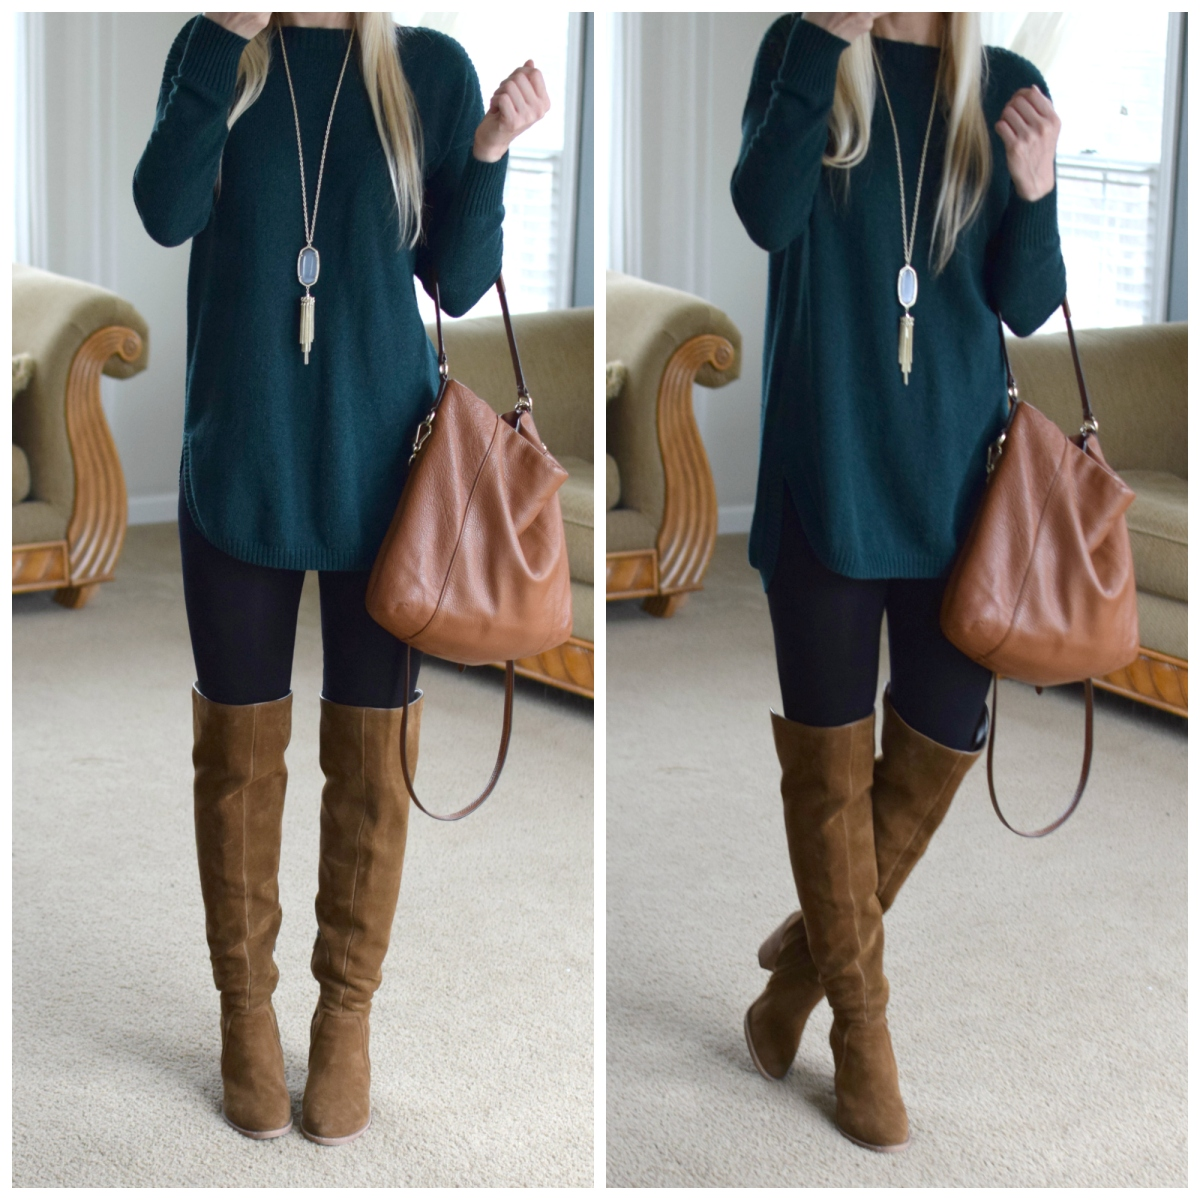 OTK boots and emerald green |www.pearlsandsportsbras.com|